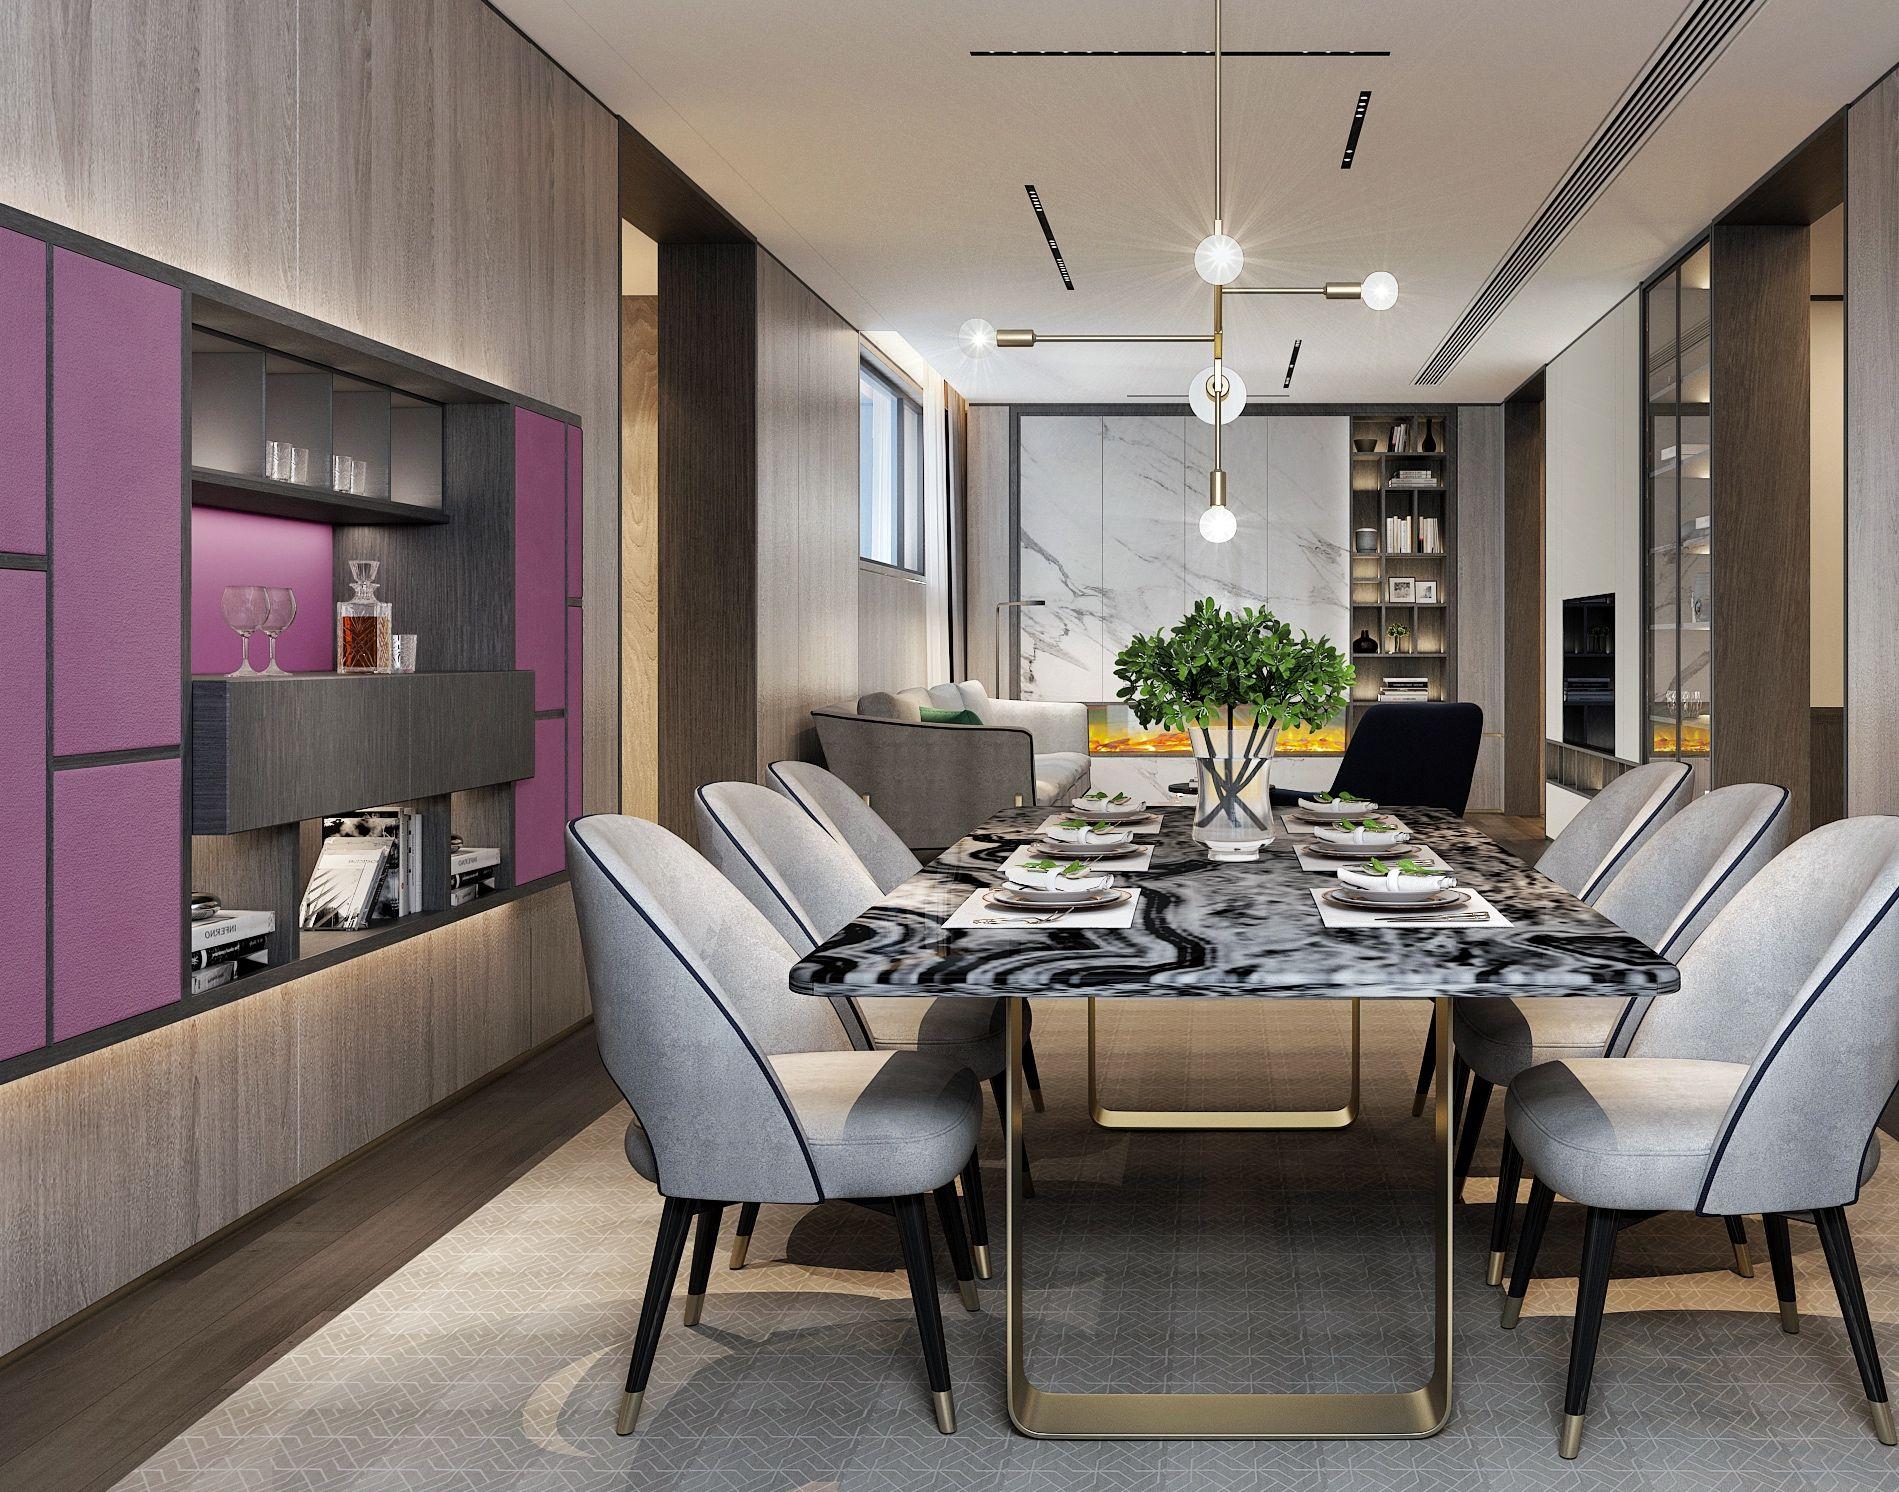 Pin By Suyili On Diningroom Dining Room Design Luxury Dining